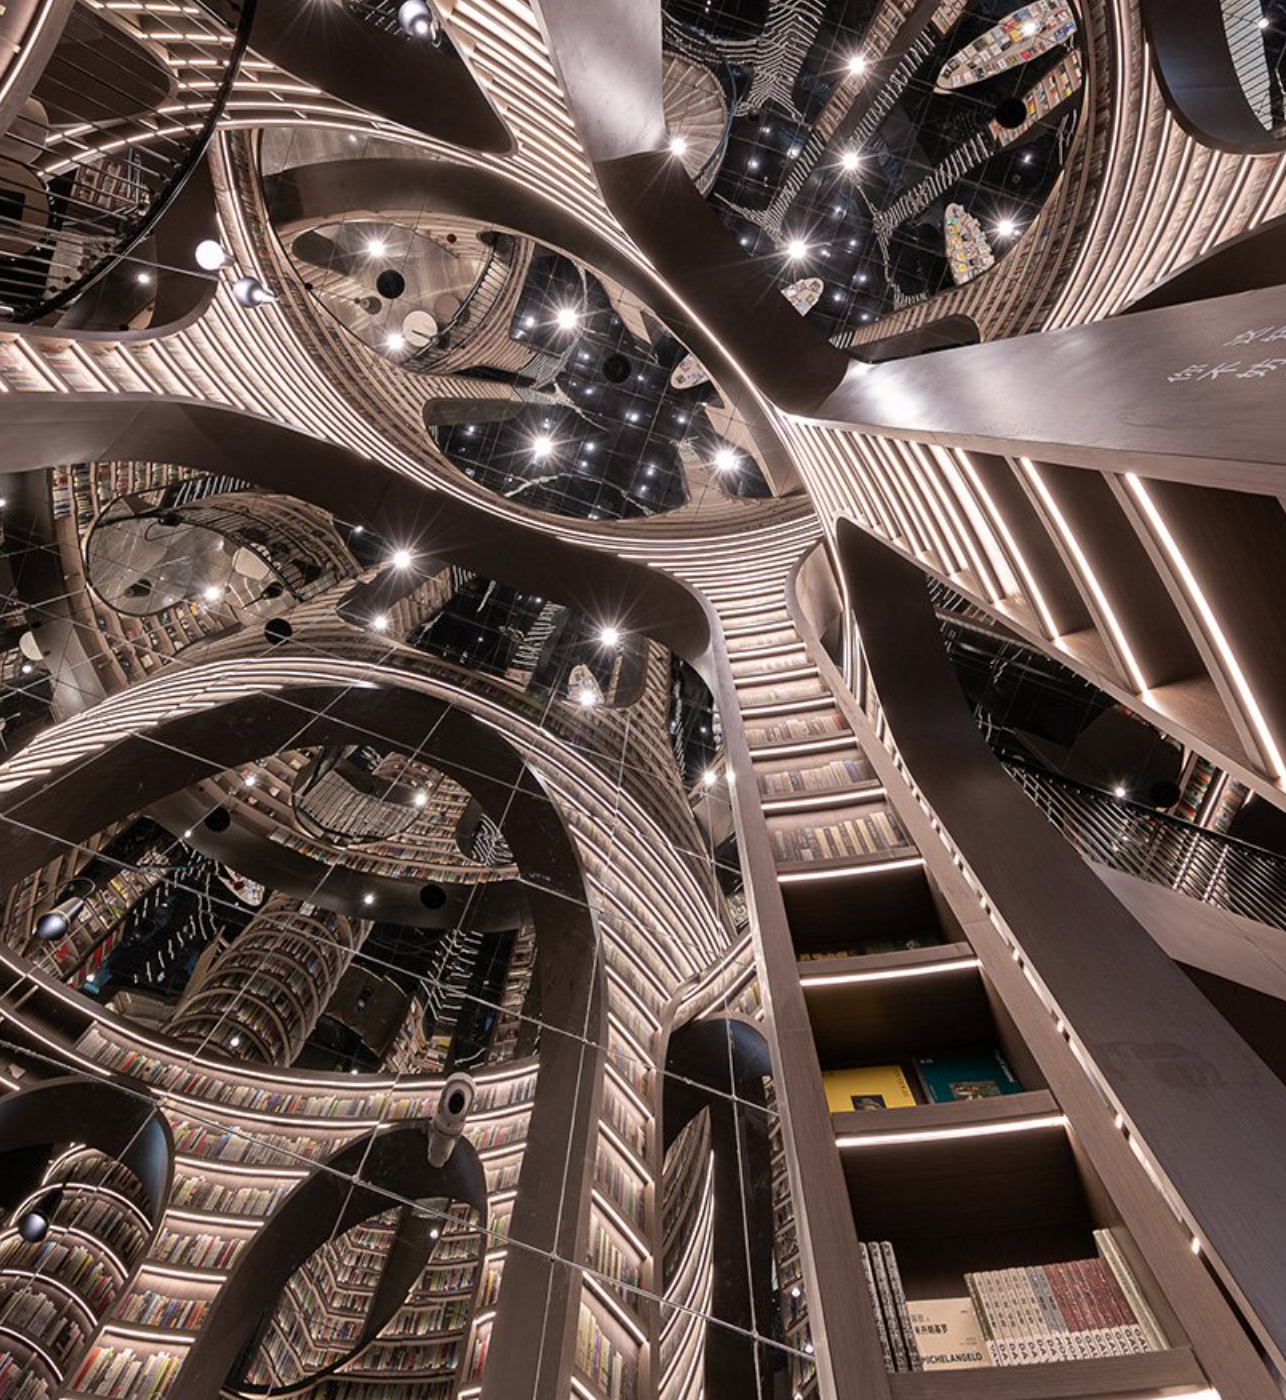 Chinese Bookstore